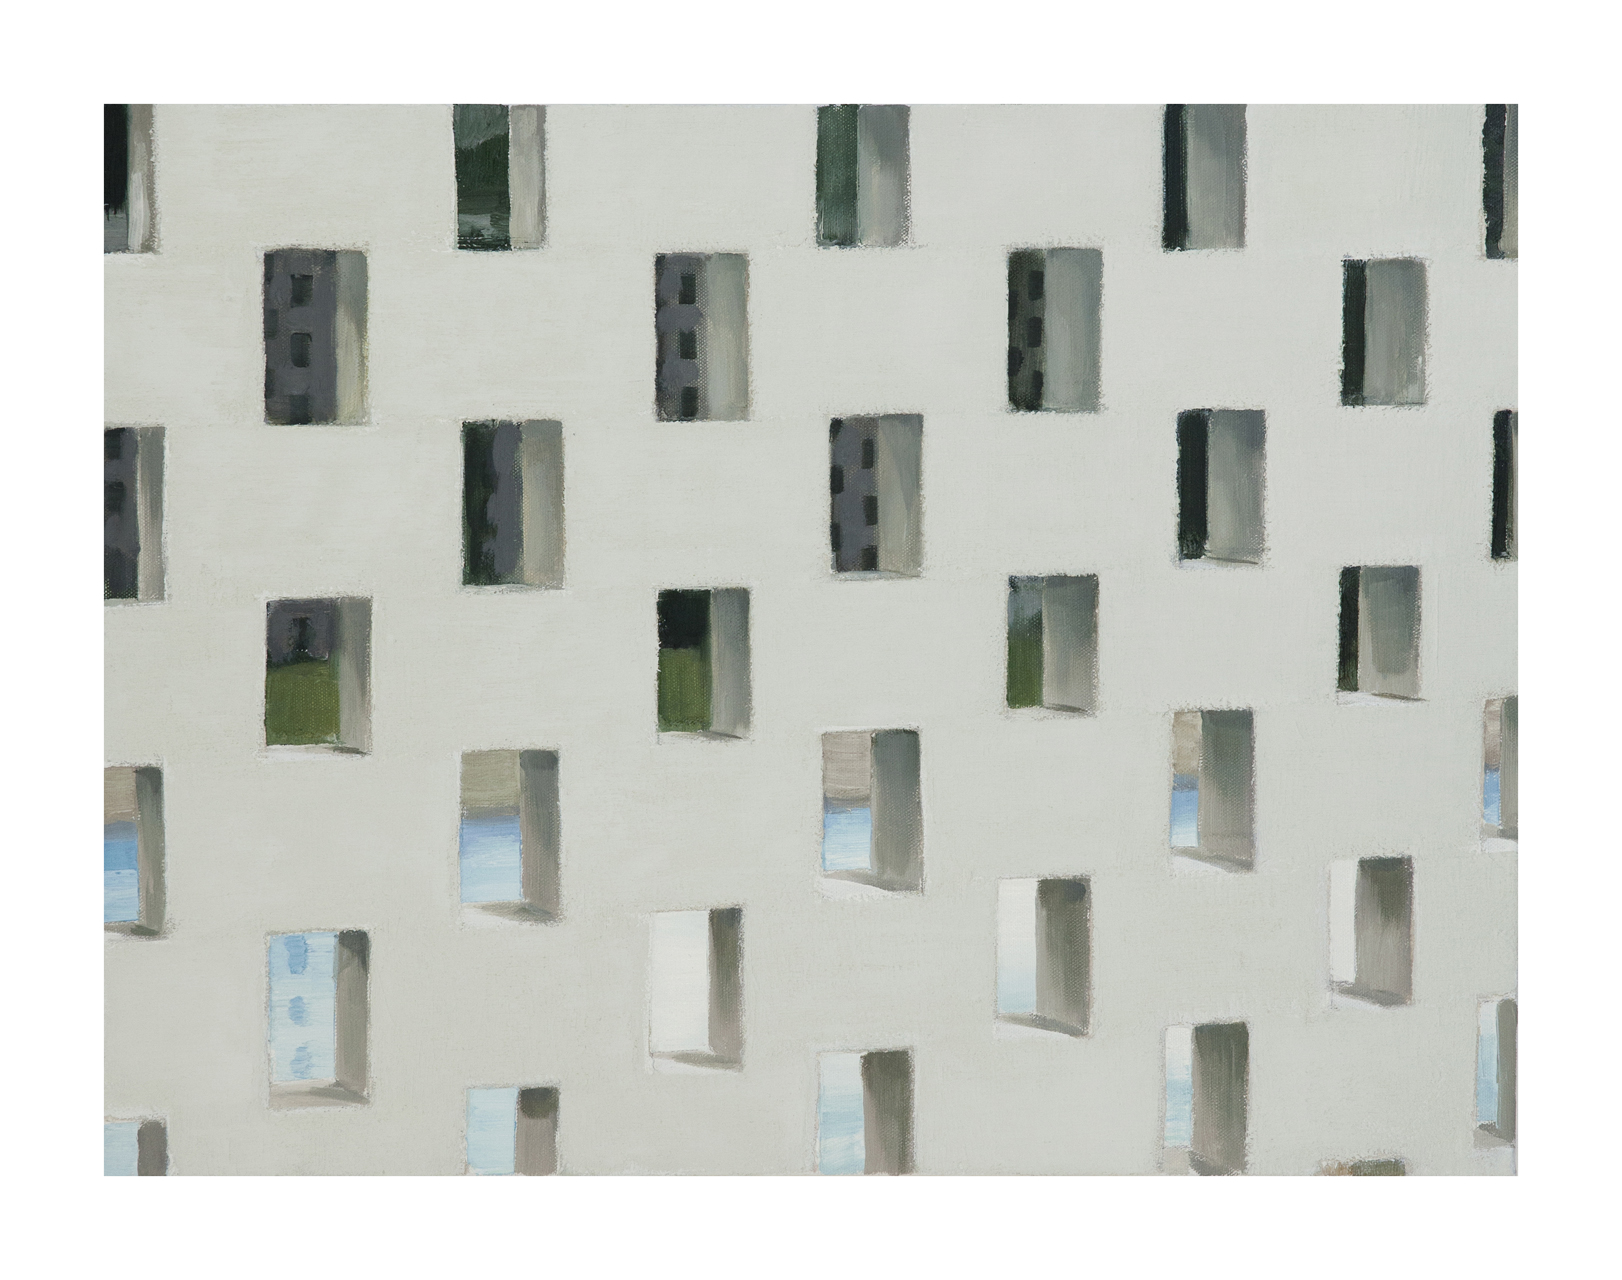 Jonathan Wateridge, Enclave Study No. 7 (Wall), 2015, Öl auf Leinwand, 45 x 60 cm